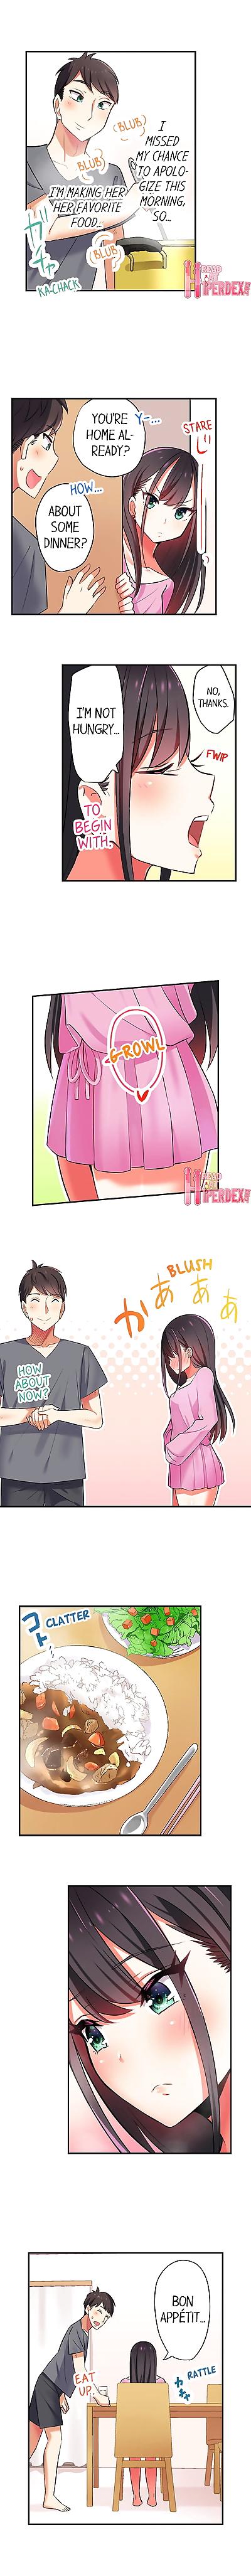 Hadagi Shojo Fucking My Niece at the Girls' Pajama Party Ch.1-6 English - part 2